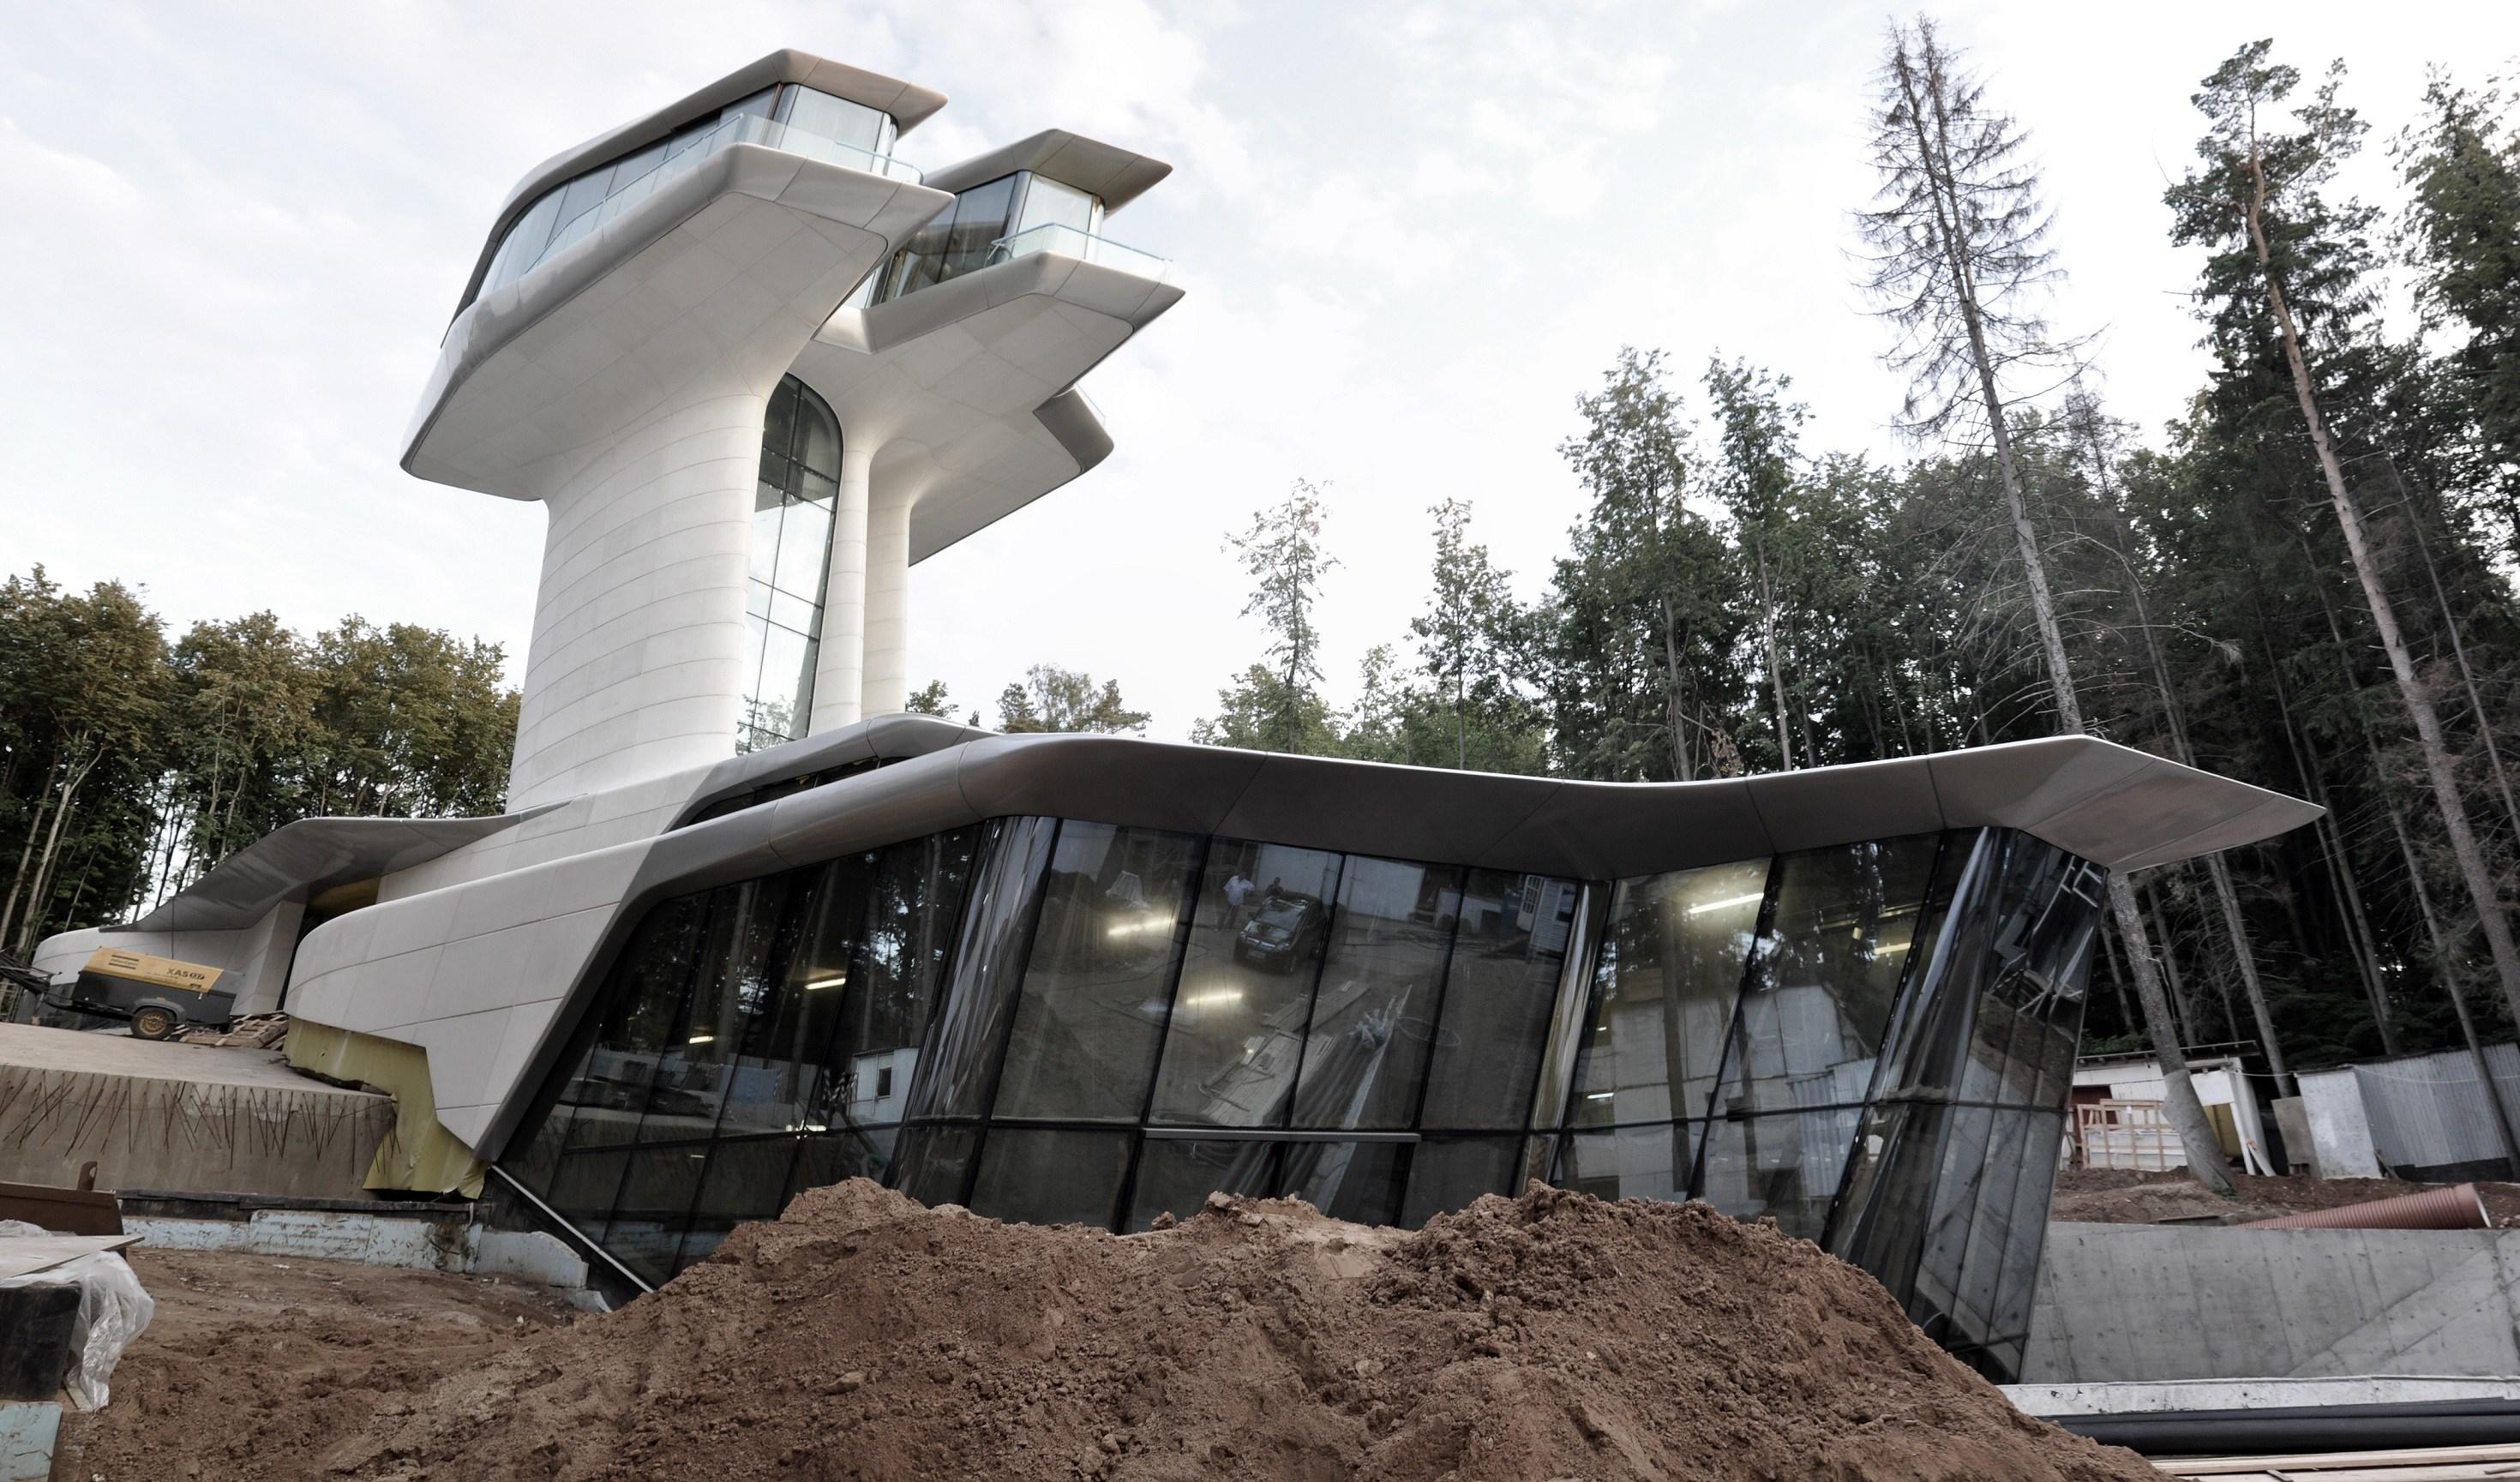 Naomi Campbell Spaceship house